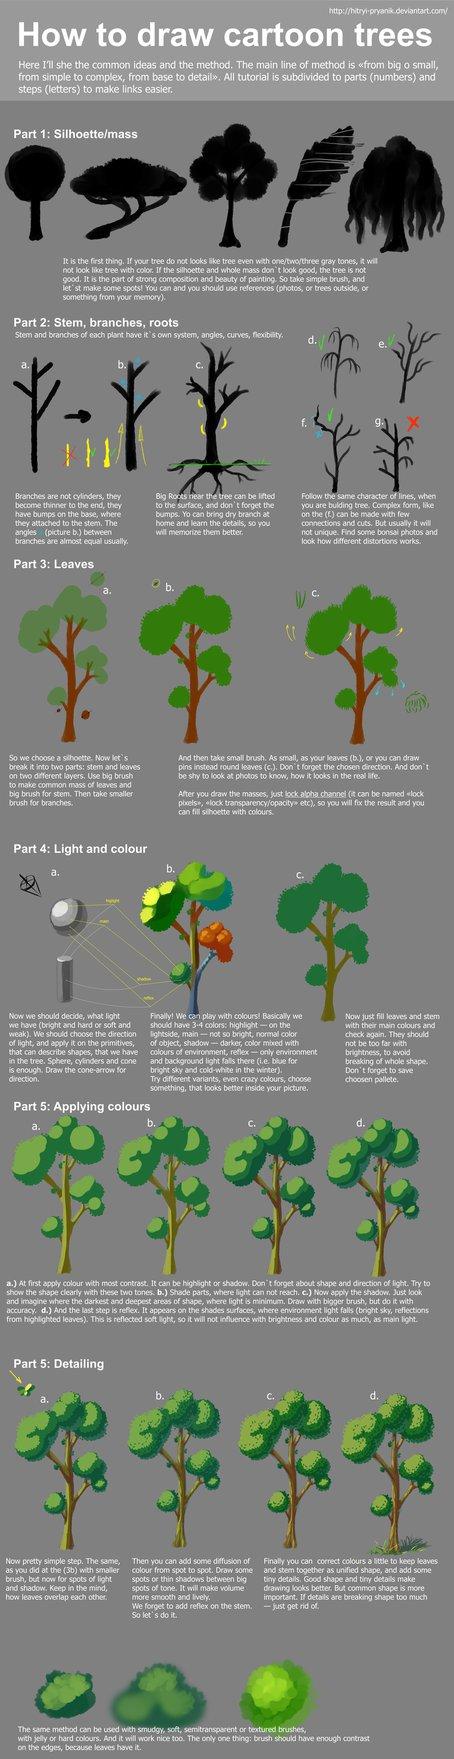 How to draw cartoon trees by hitryipryanik dessin pinterest